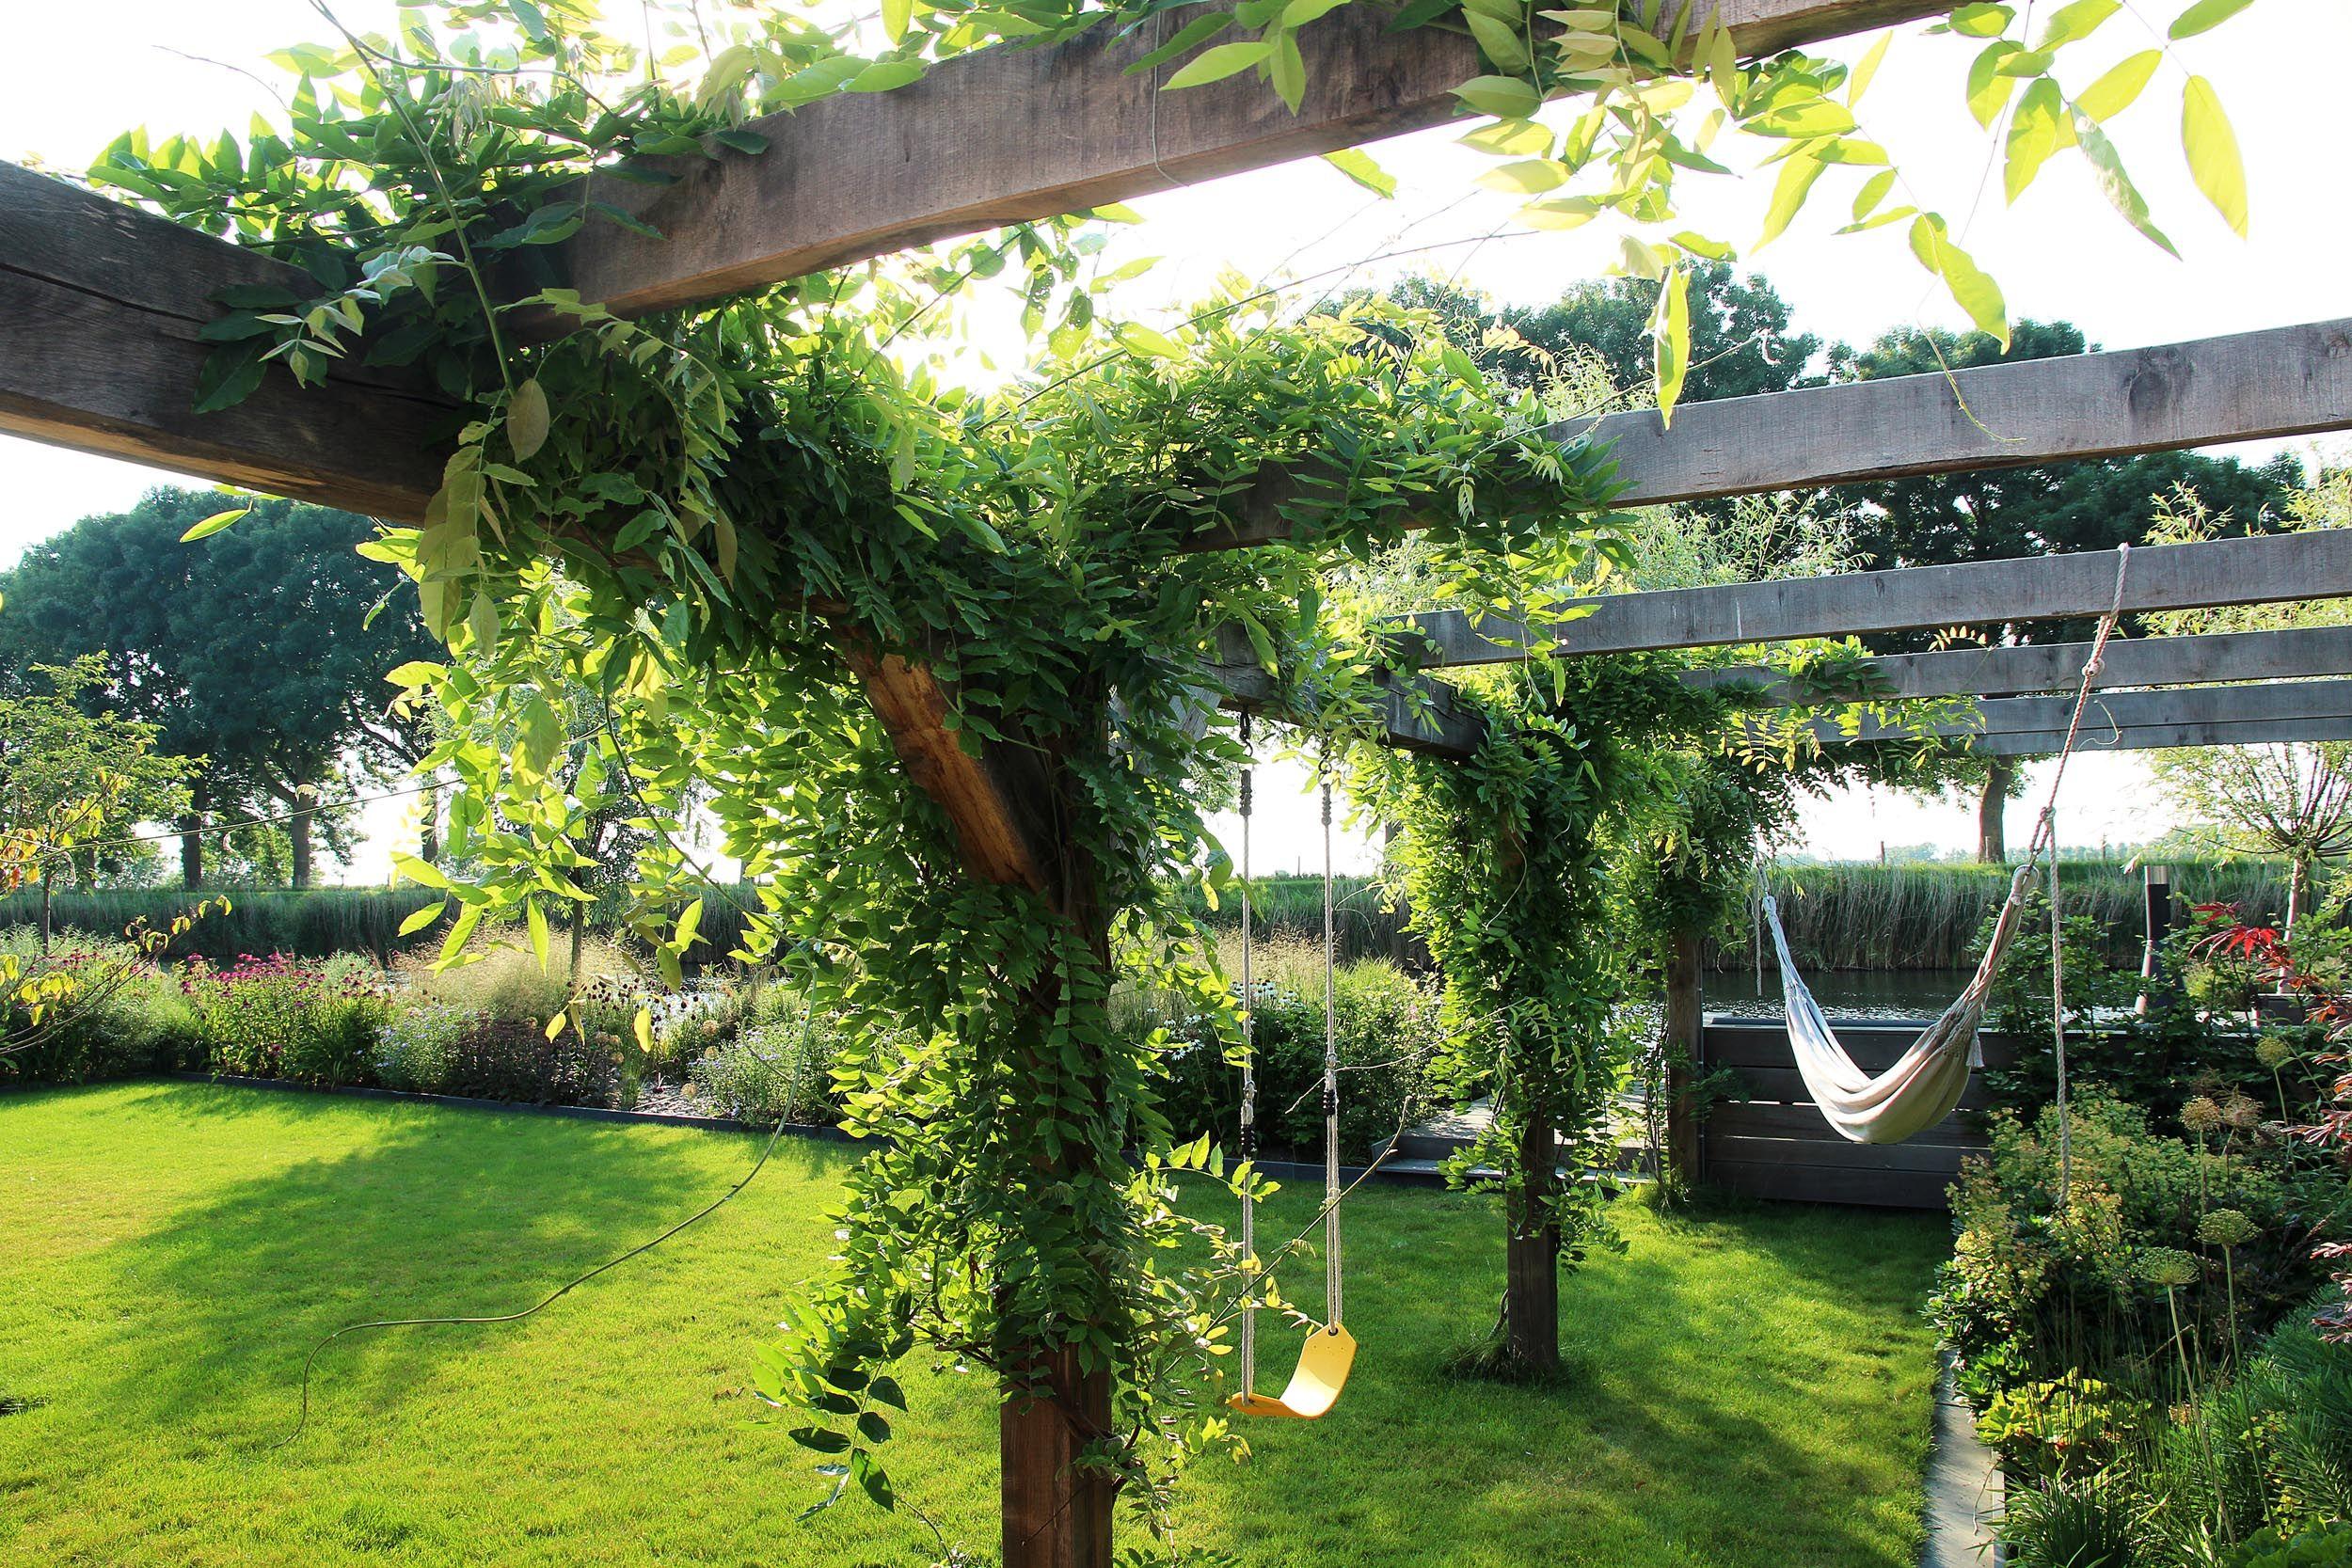 Pin by mary baggins on dream yard pinterest pergolas gardens